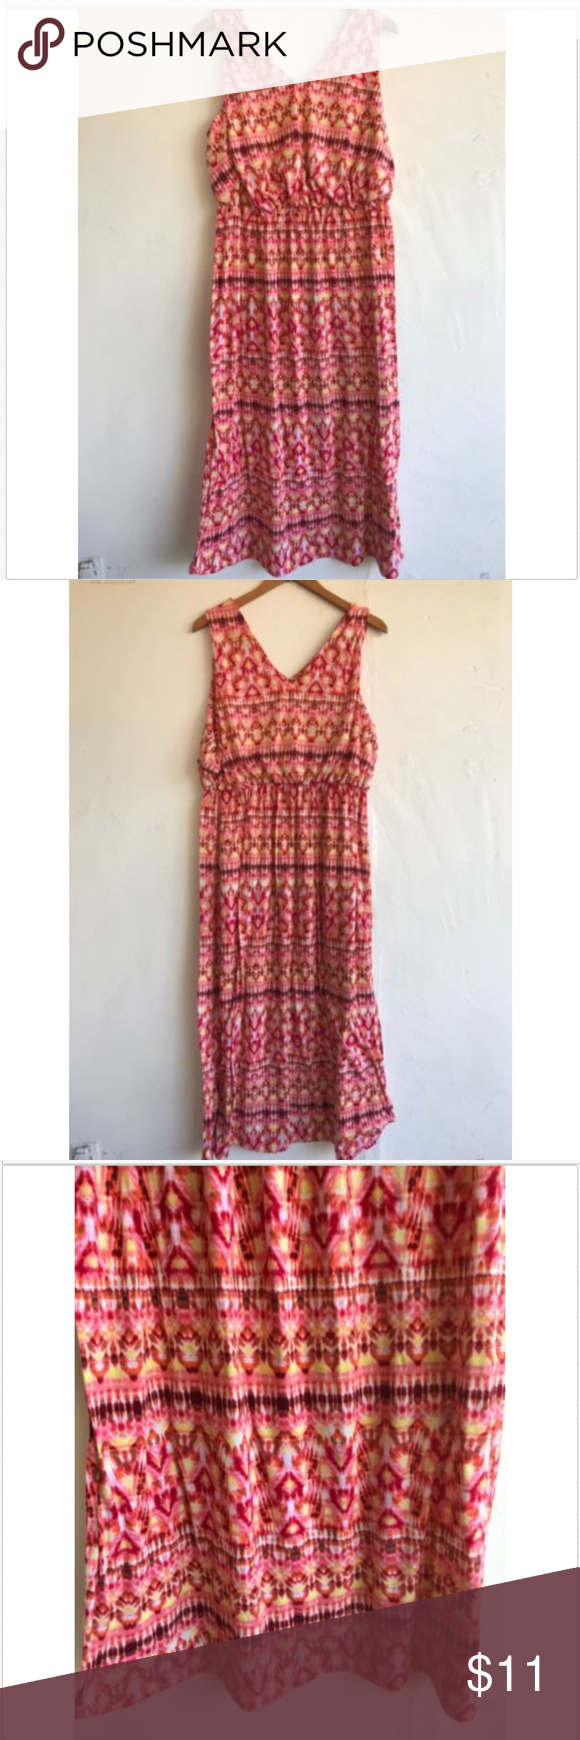 Nwt Torrid Super Soft Hem Maxi Dress Size 2x Maxi Dress Dresses Torrid [ 1740 x 580 Pixel ]